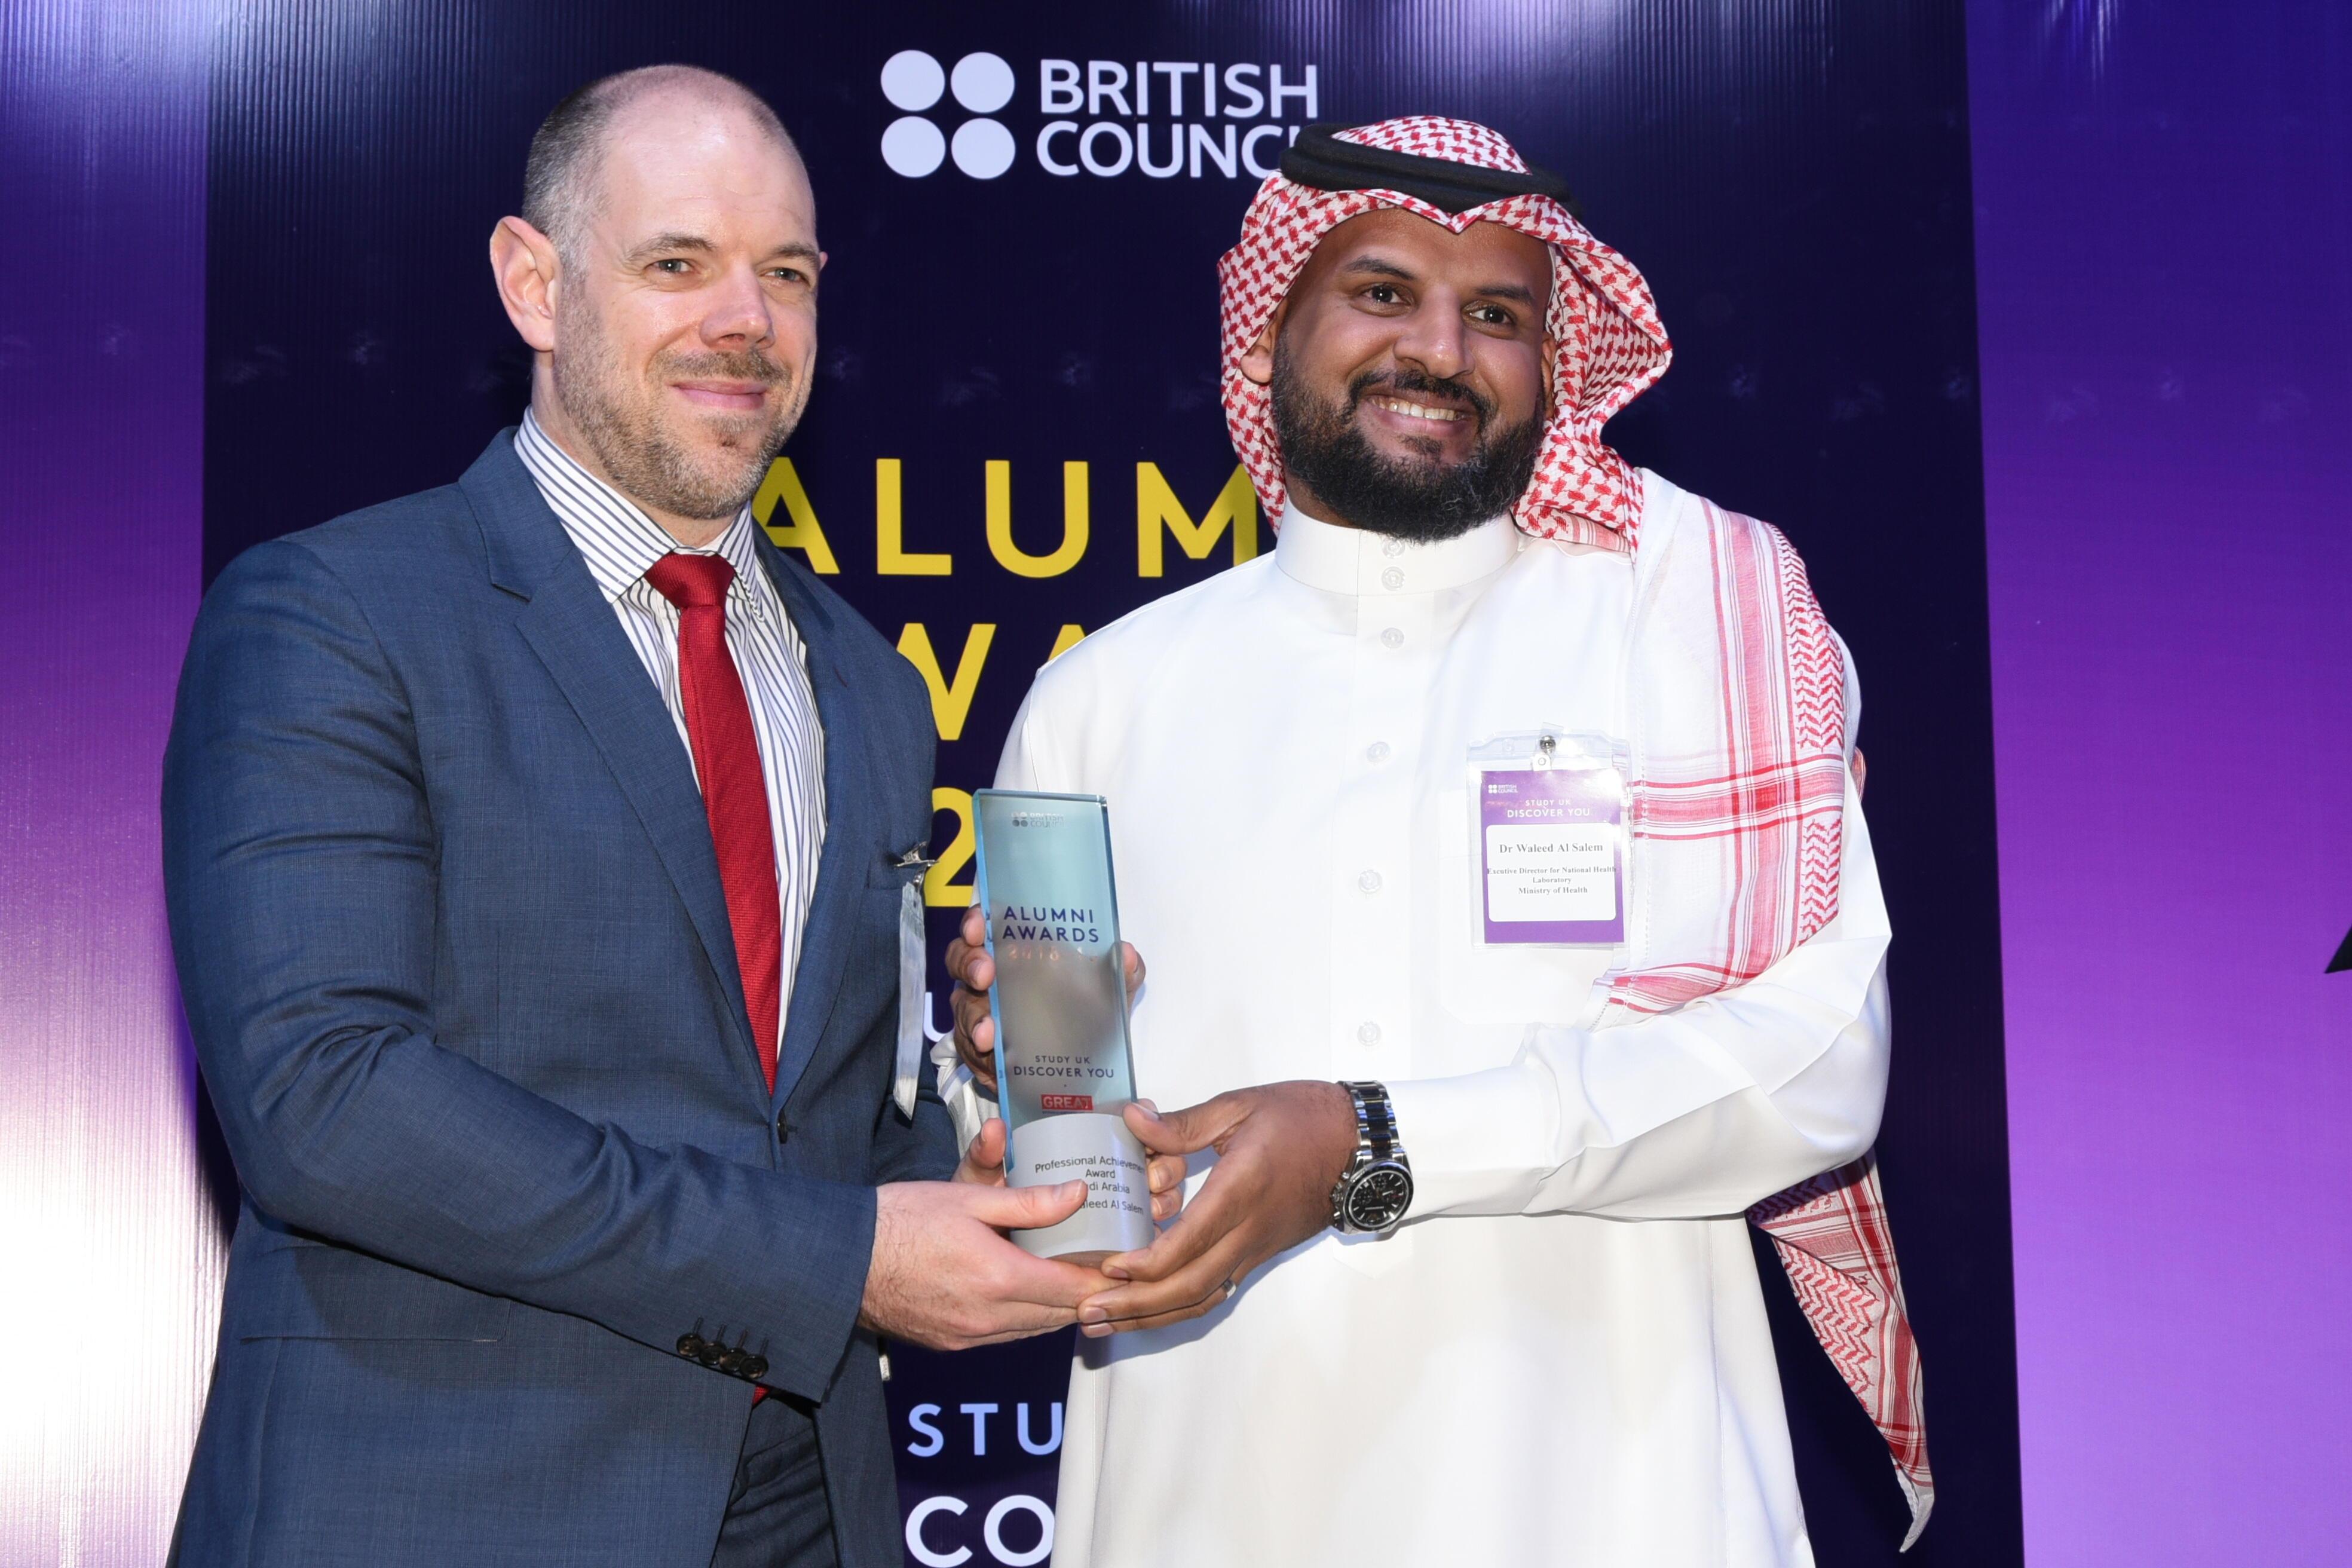 Dr Waleed receiving the award from deputy ambassador Mr Richard Oppenheim